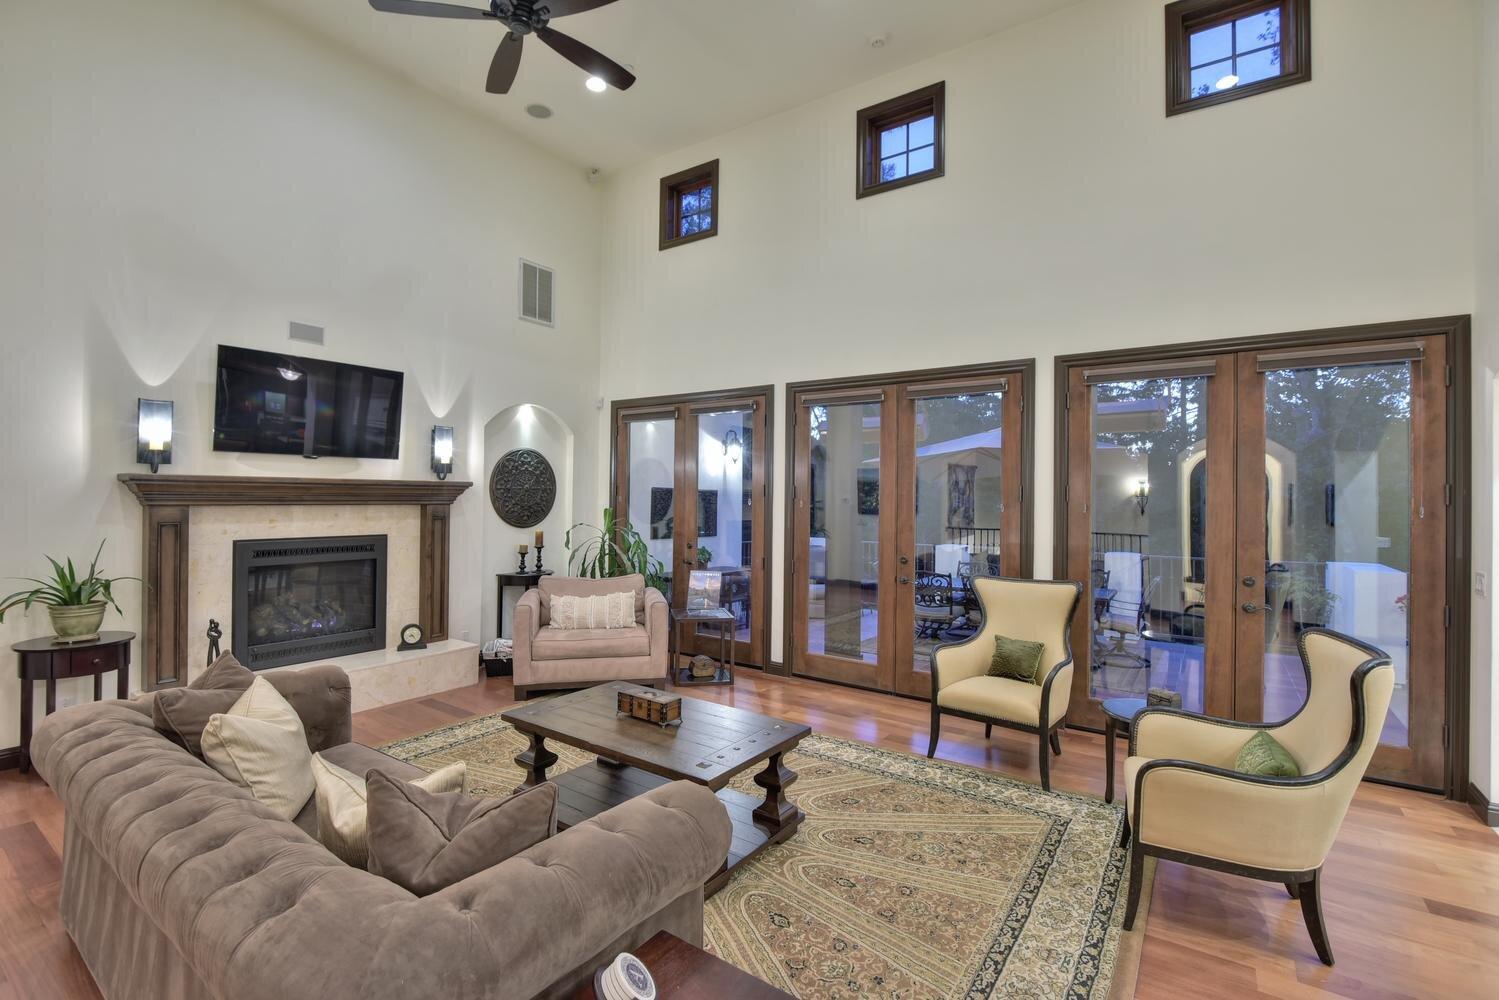 16021 Winterbrook Rd Los Gatos-large-014-013-Living Room View to Patio-1499x1000-72dpi.jpg